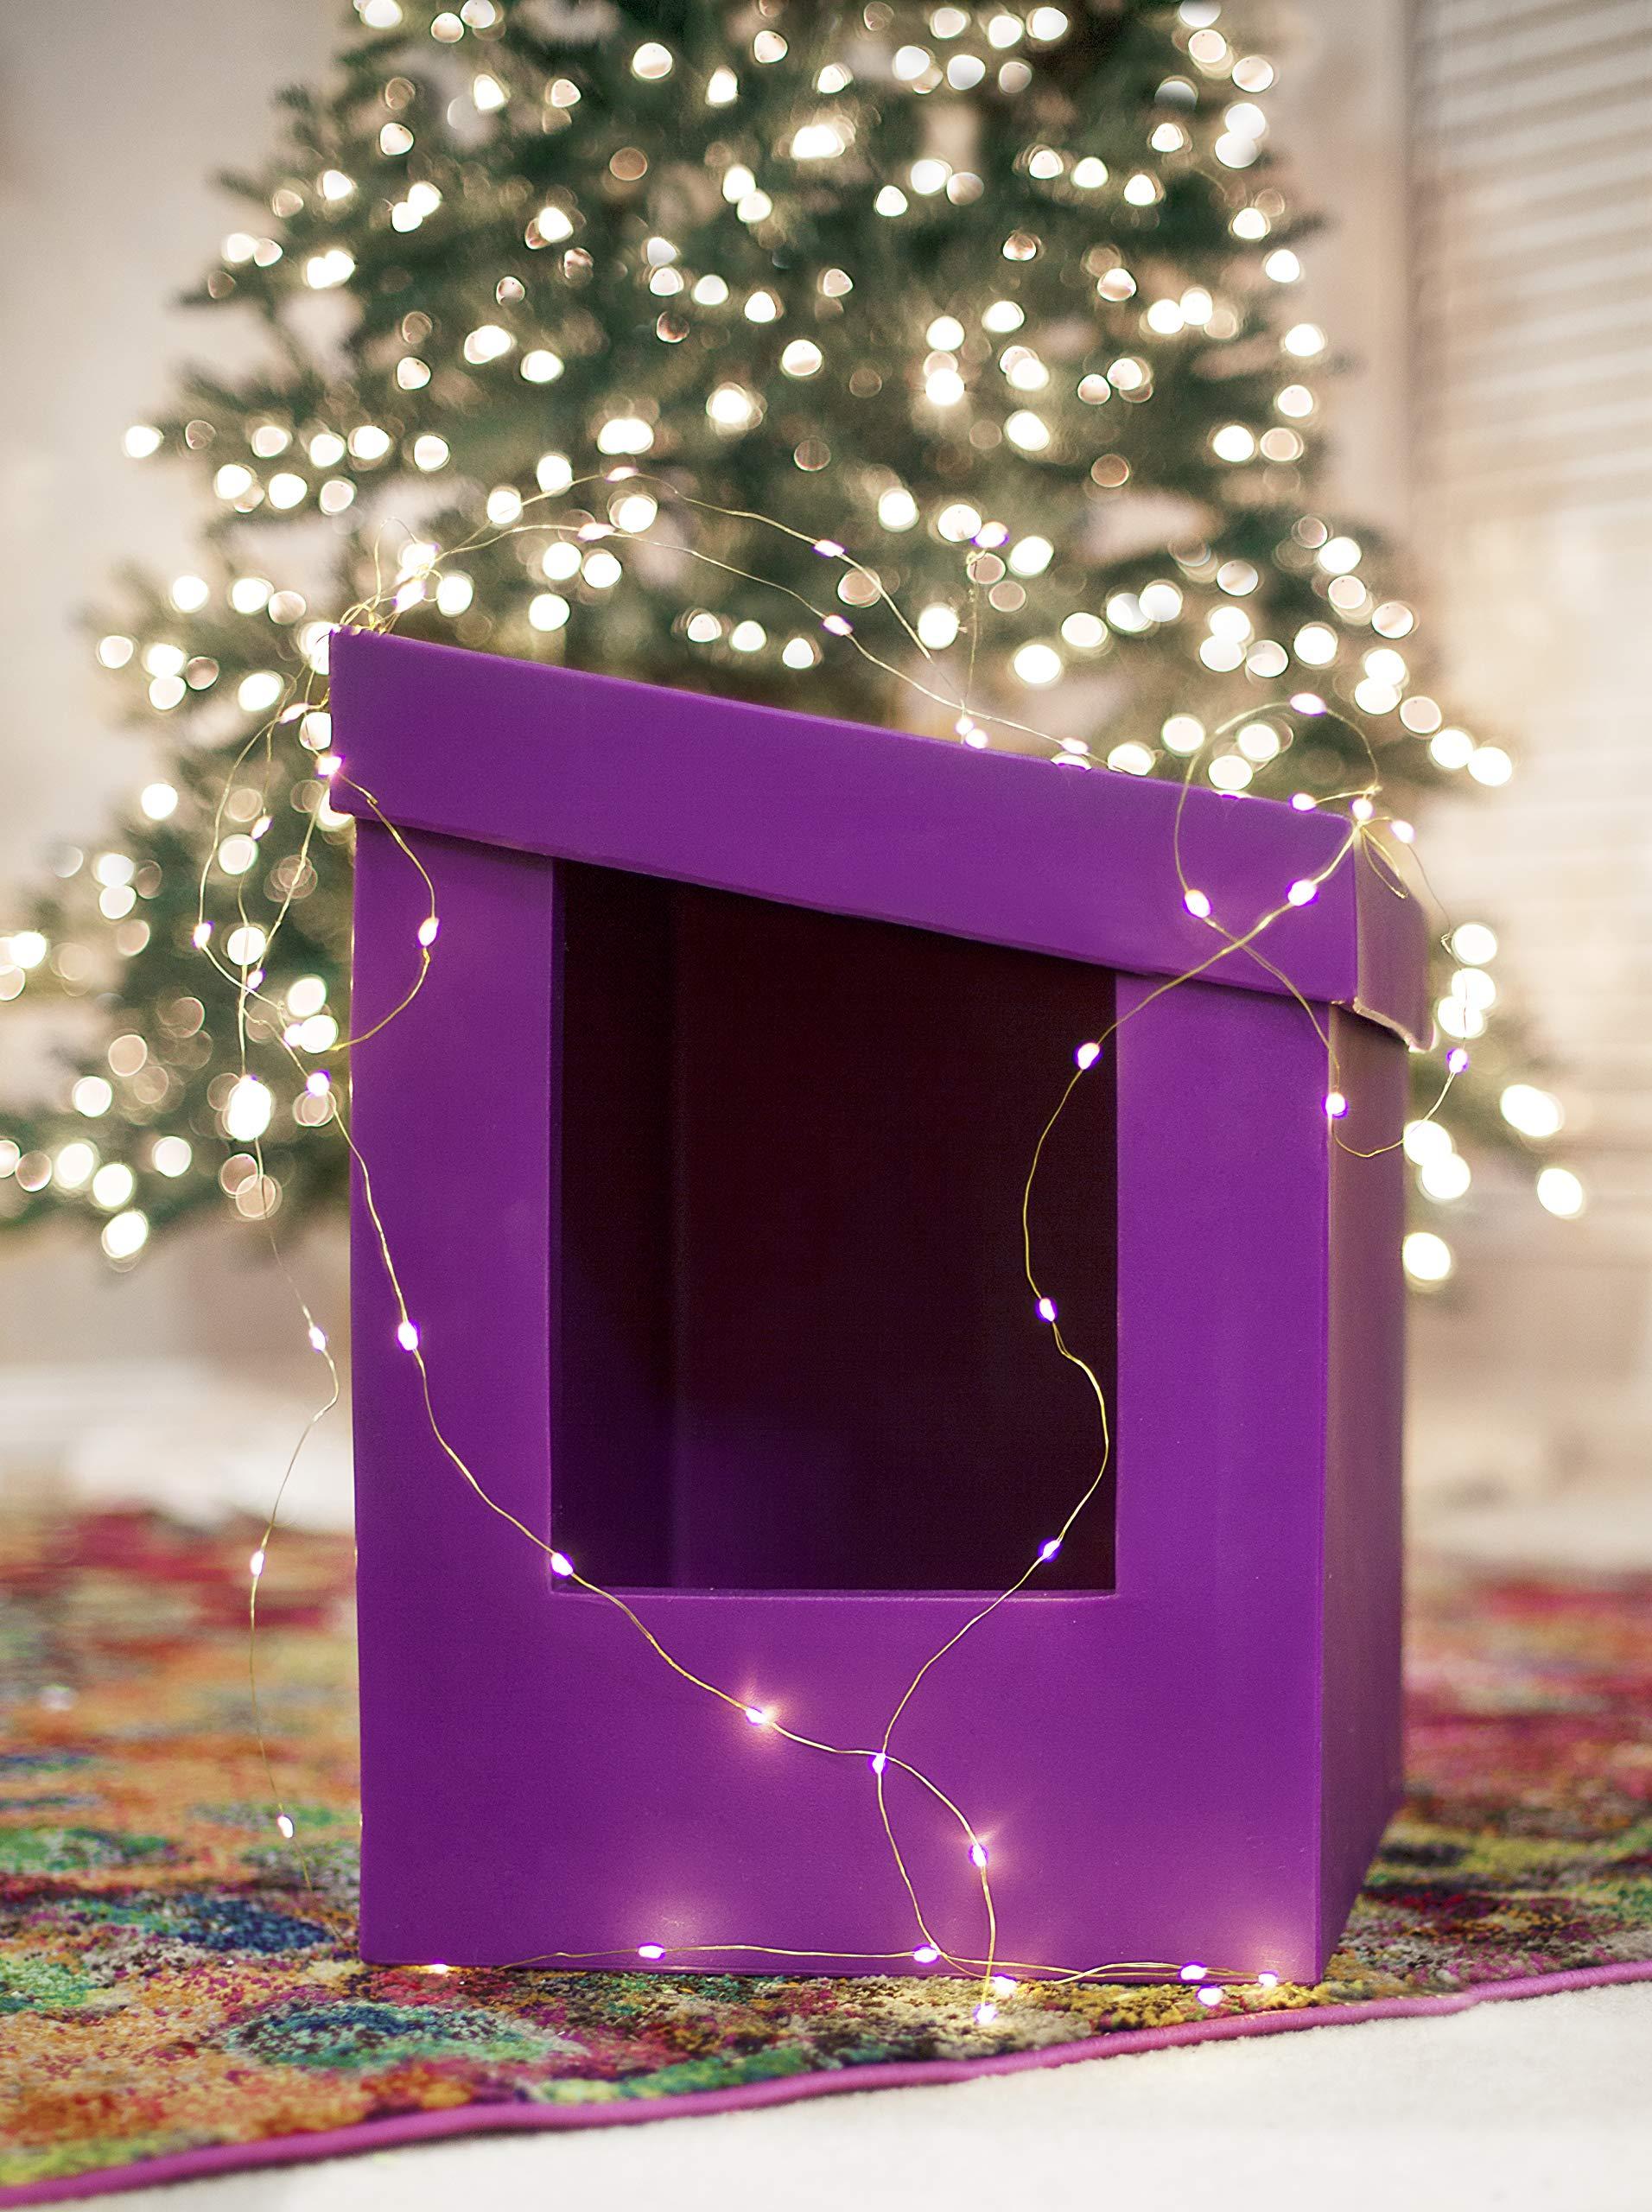 Kitangle Slope Style Modern Cat Litter Box, Purple by Kitangle